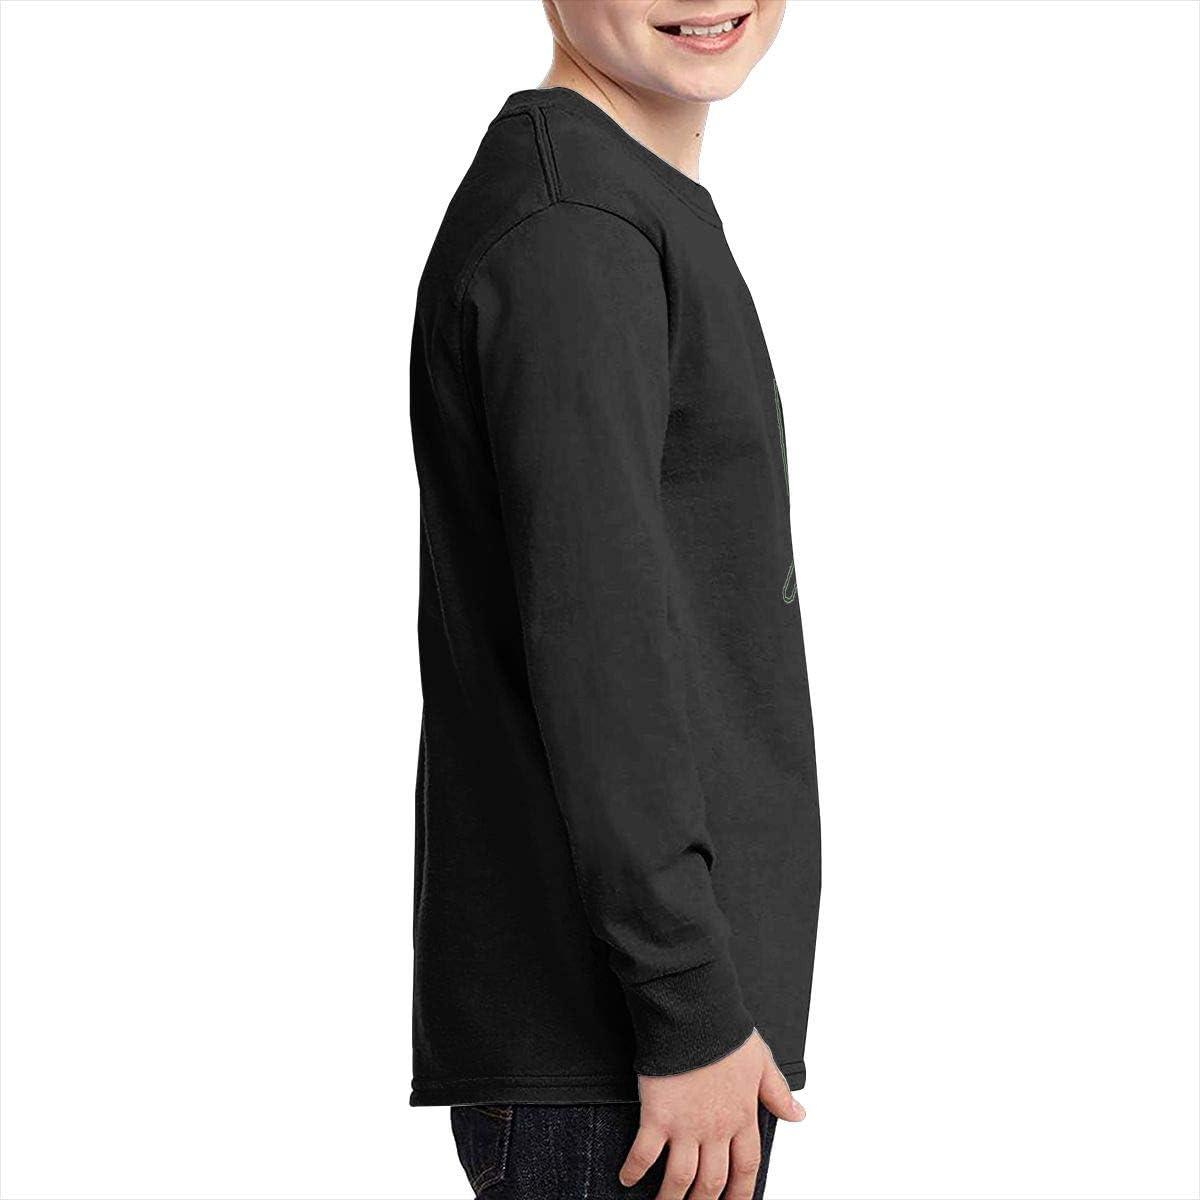 MARRITI Stick Figure Cat Junior Long Sleeve T-Shirt Funny Boys Long Sleeve Round Neck Graphic Tees Black